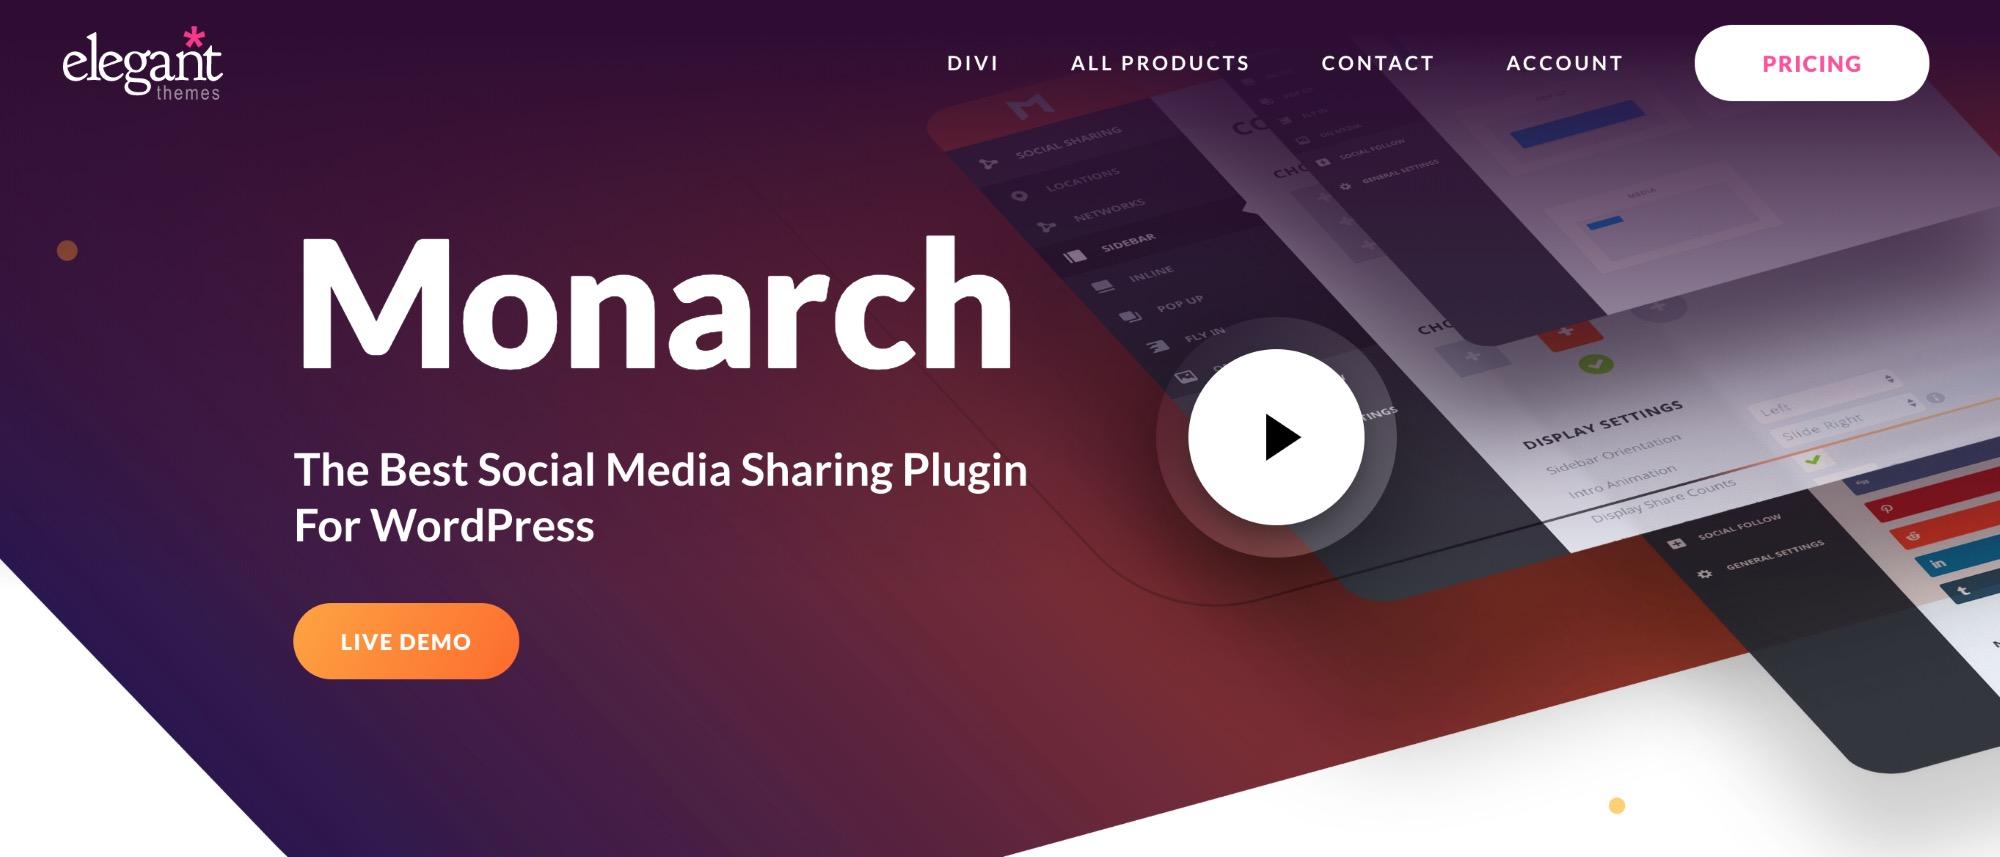 monarch-wordpress-social-sharing-plugins